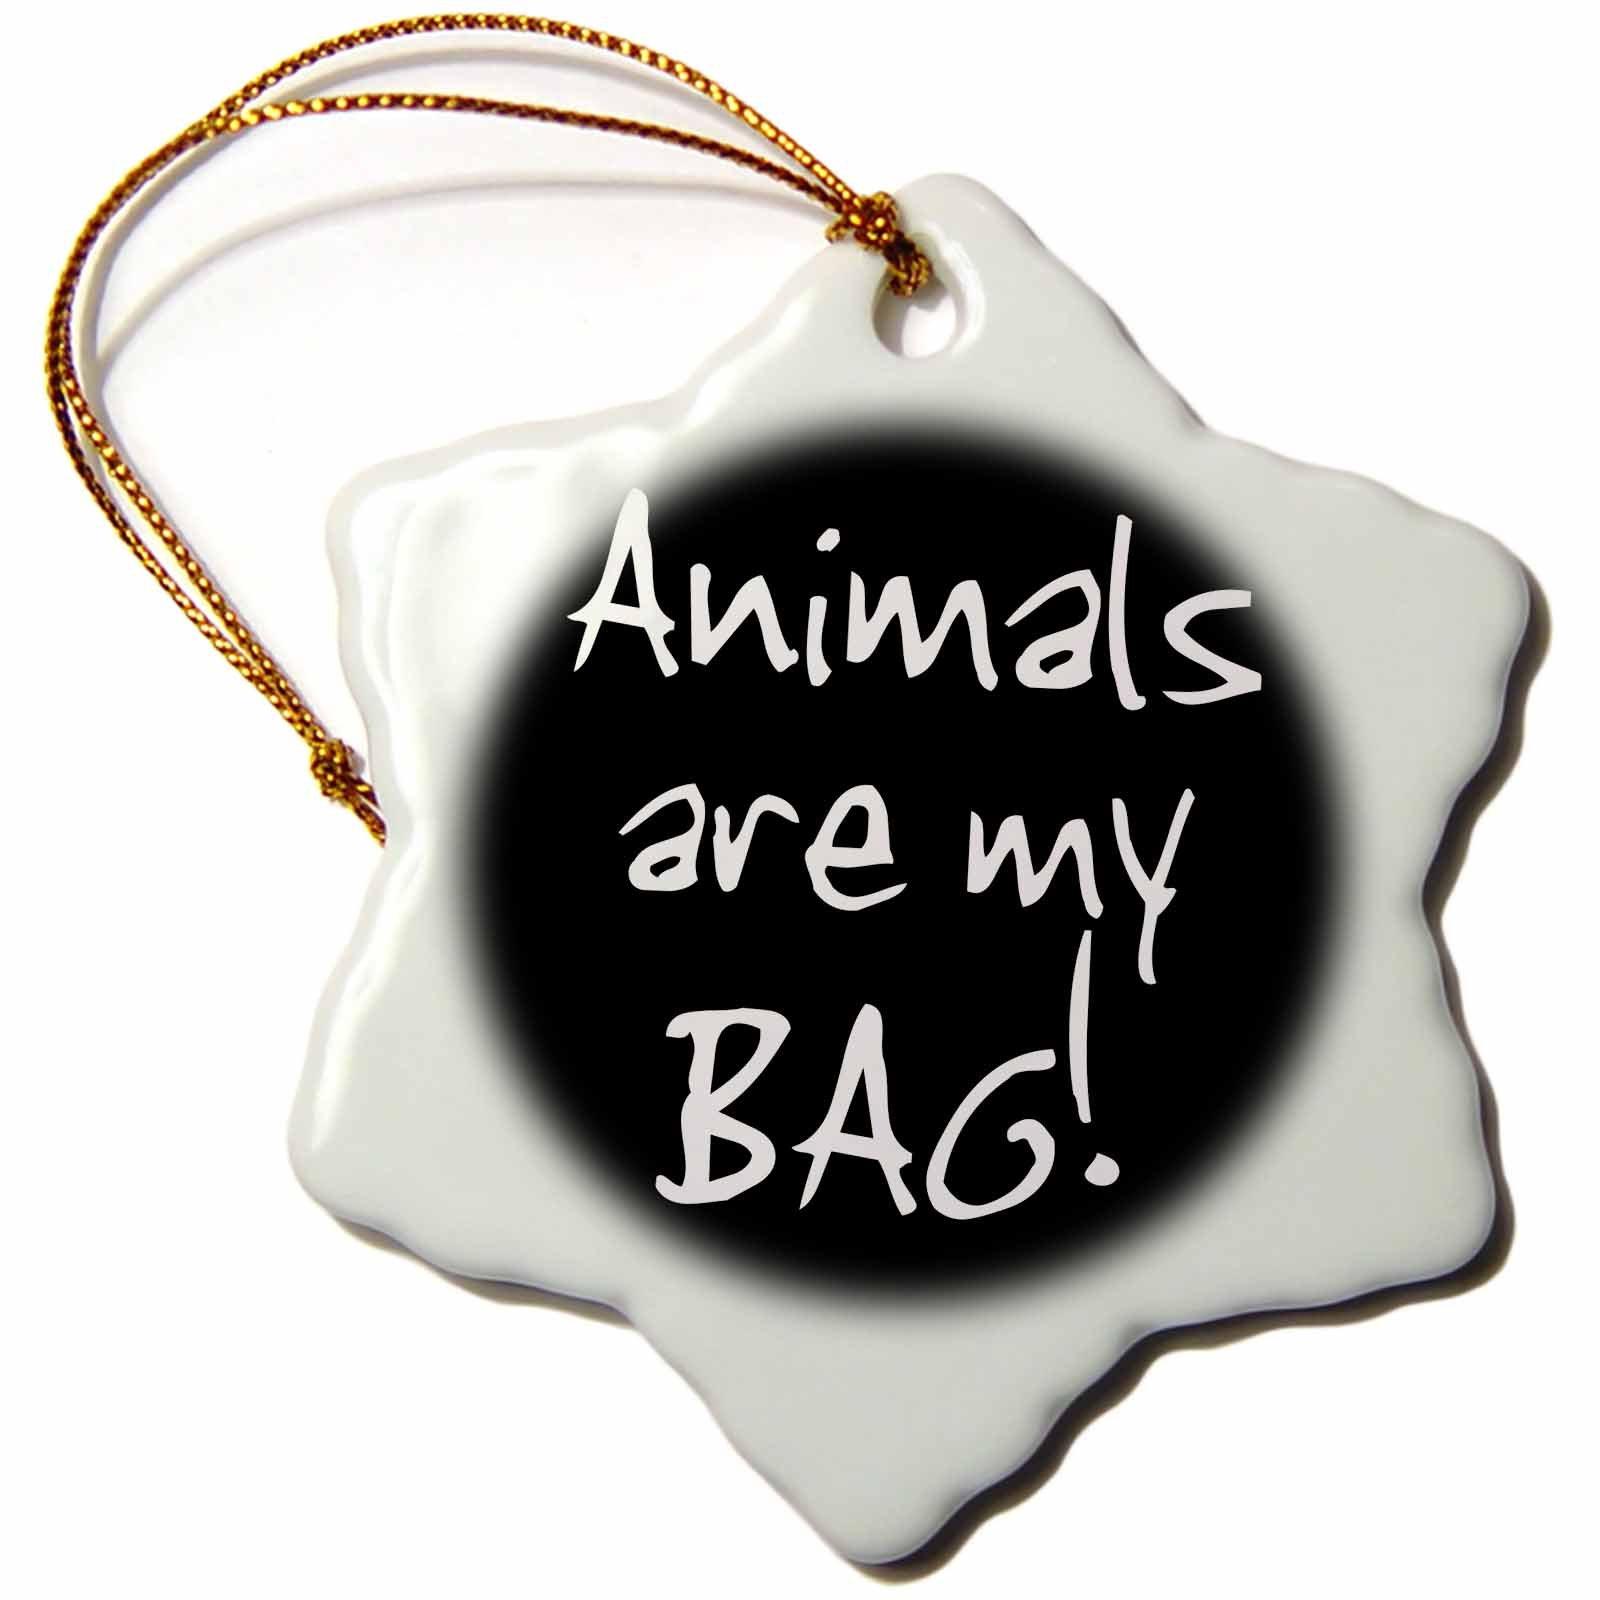 3dRose Bag Animal Lover Pet Owner Or Vet Black and White Text Snowflake Ornament, 3''